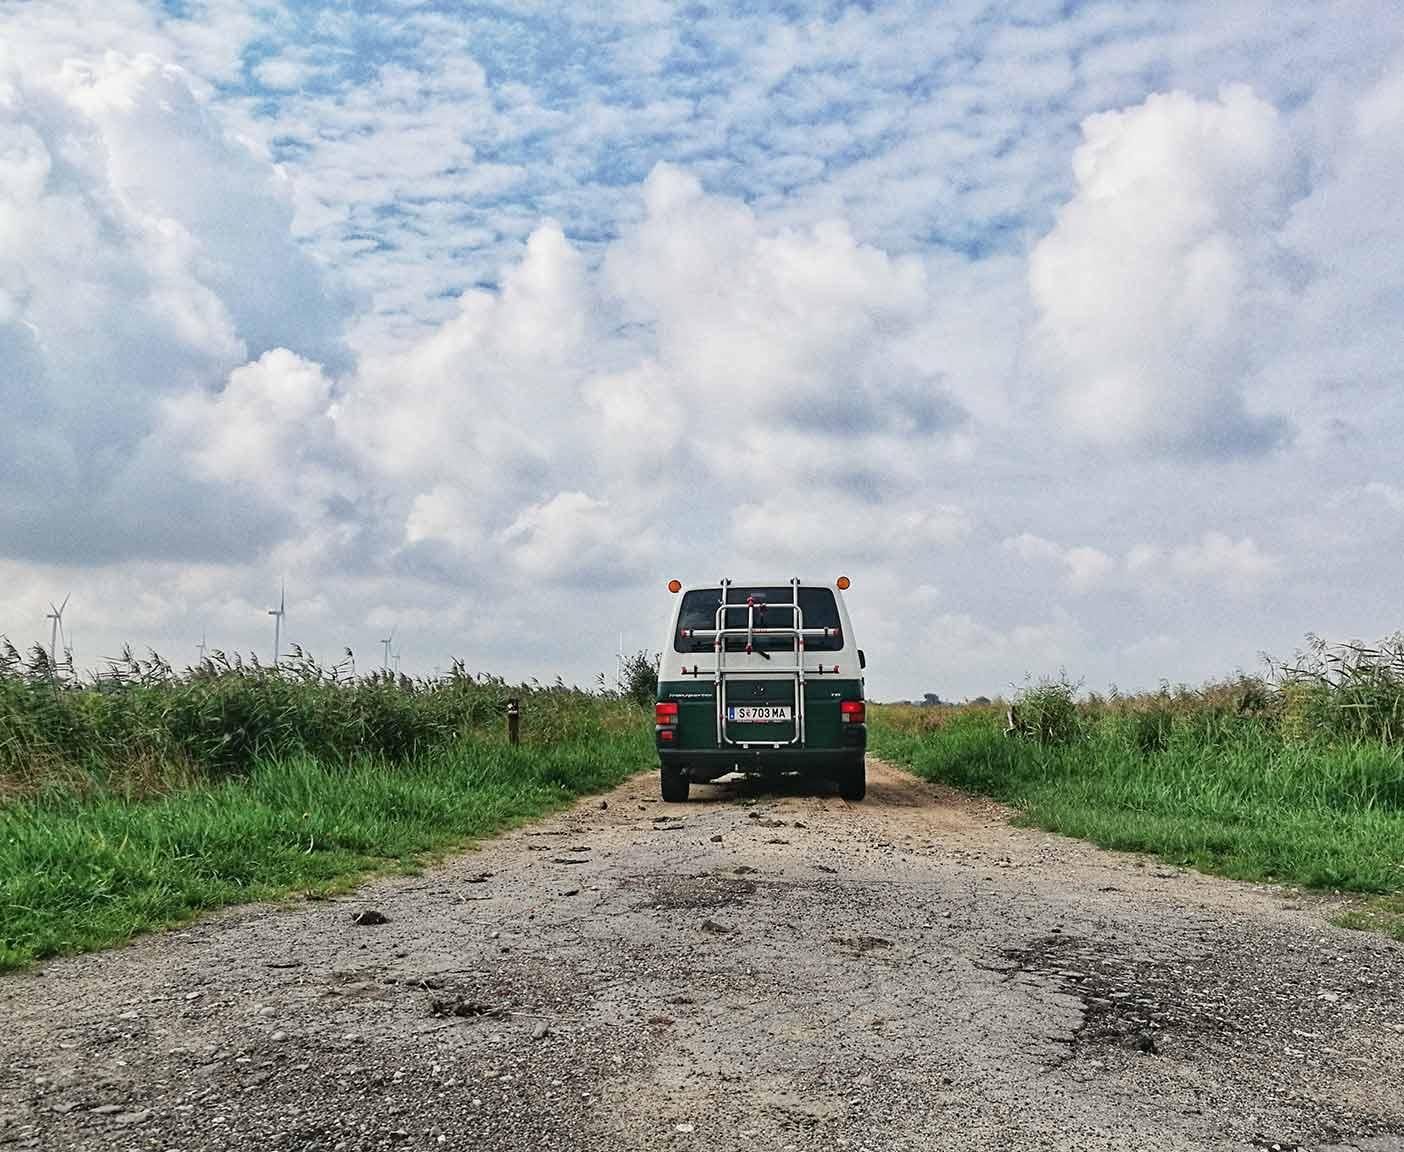 VW-T4-Camper-Syncro-caravelle-california-pritsche-multivan-wildcampen-kaufen